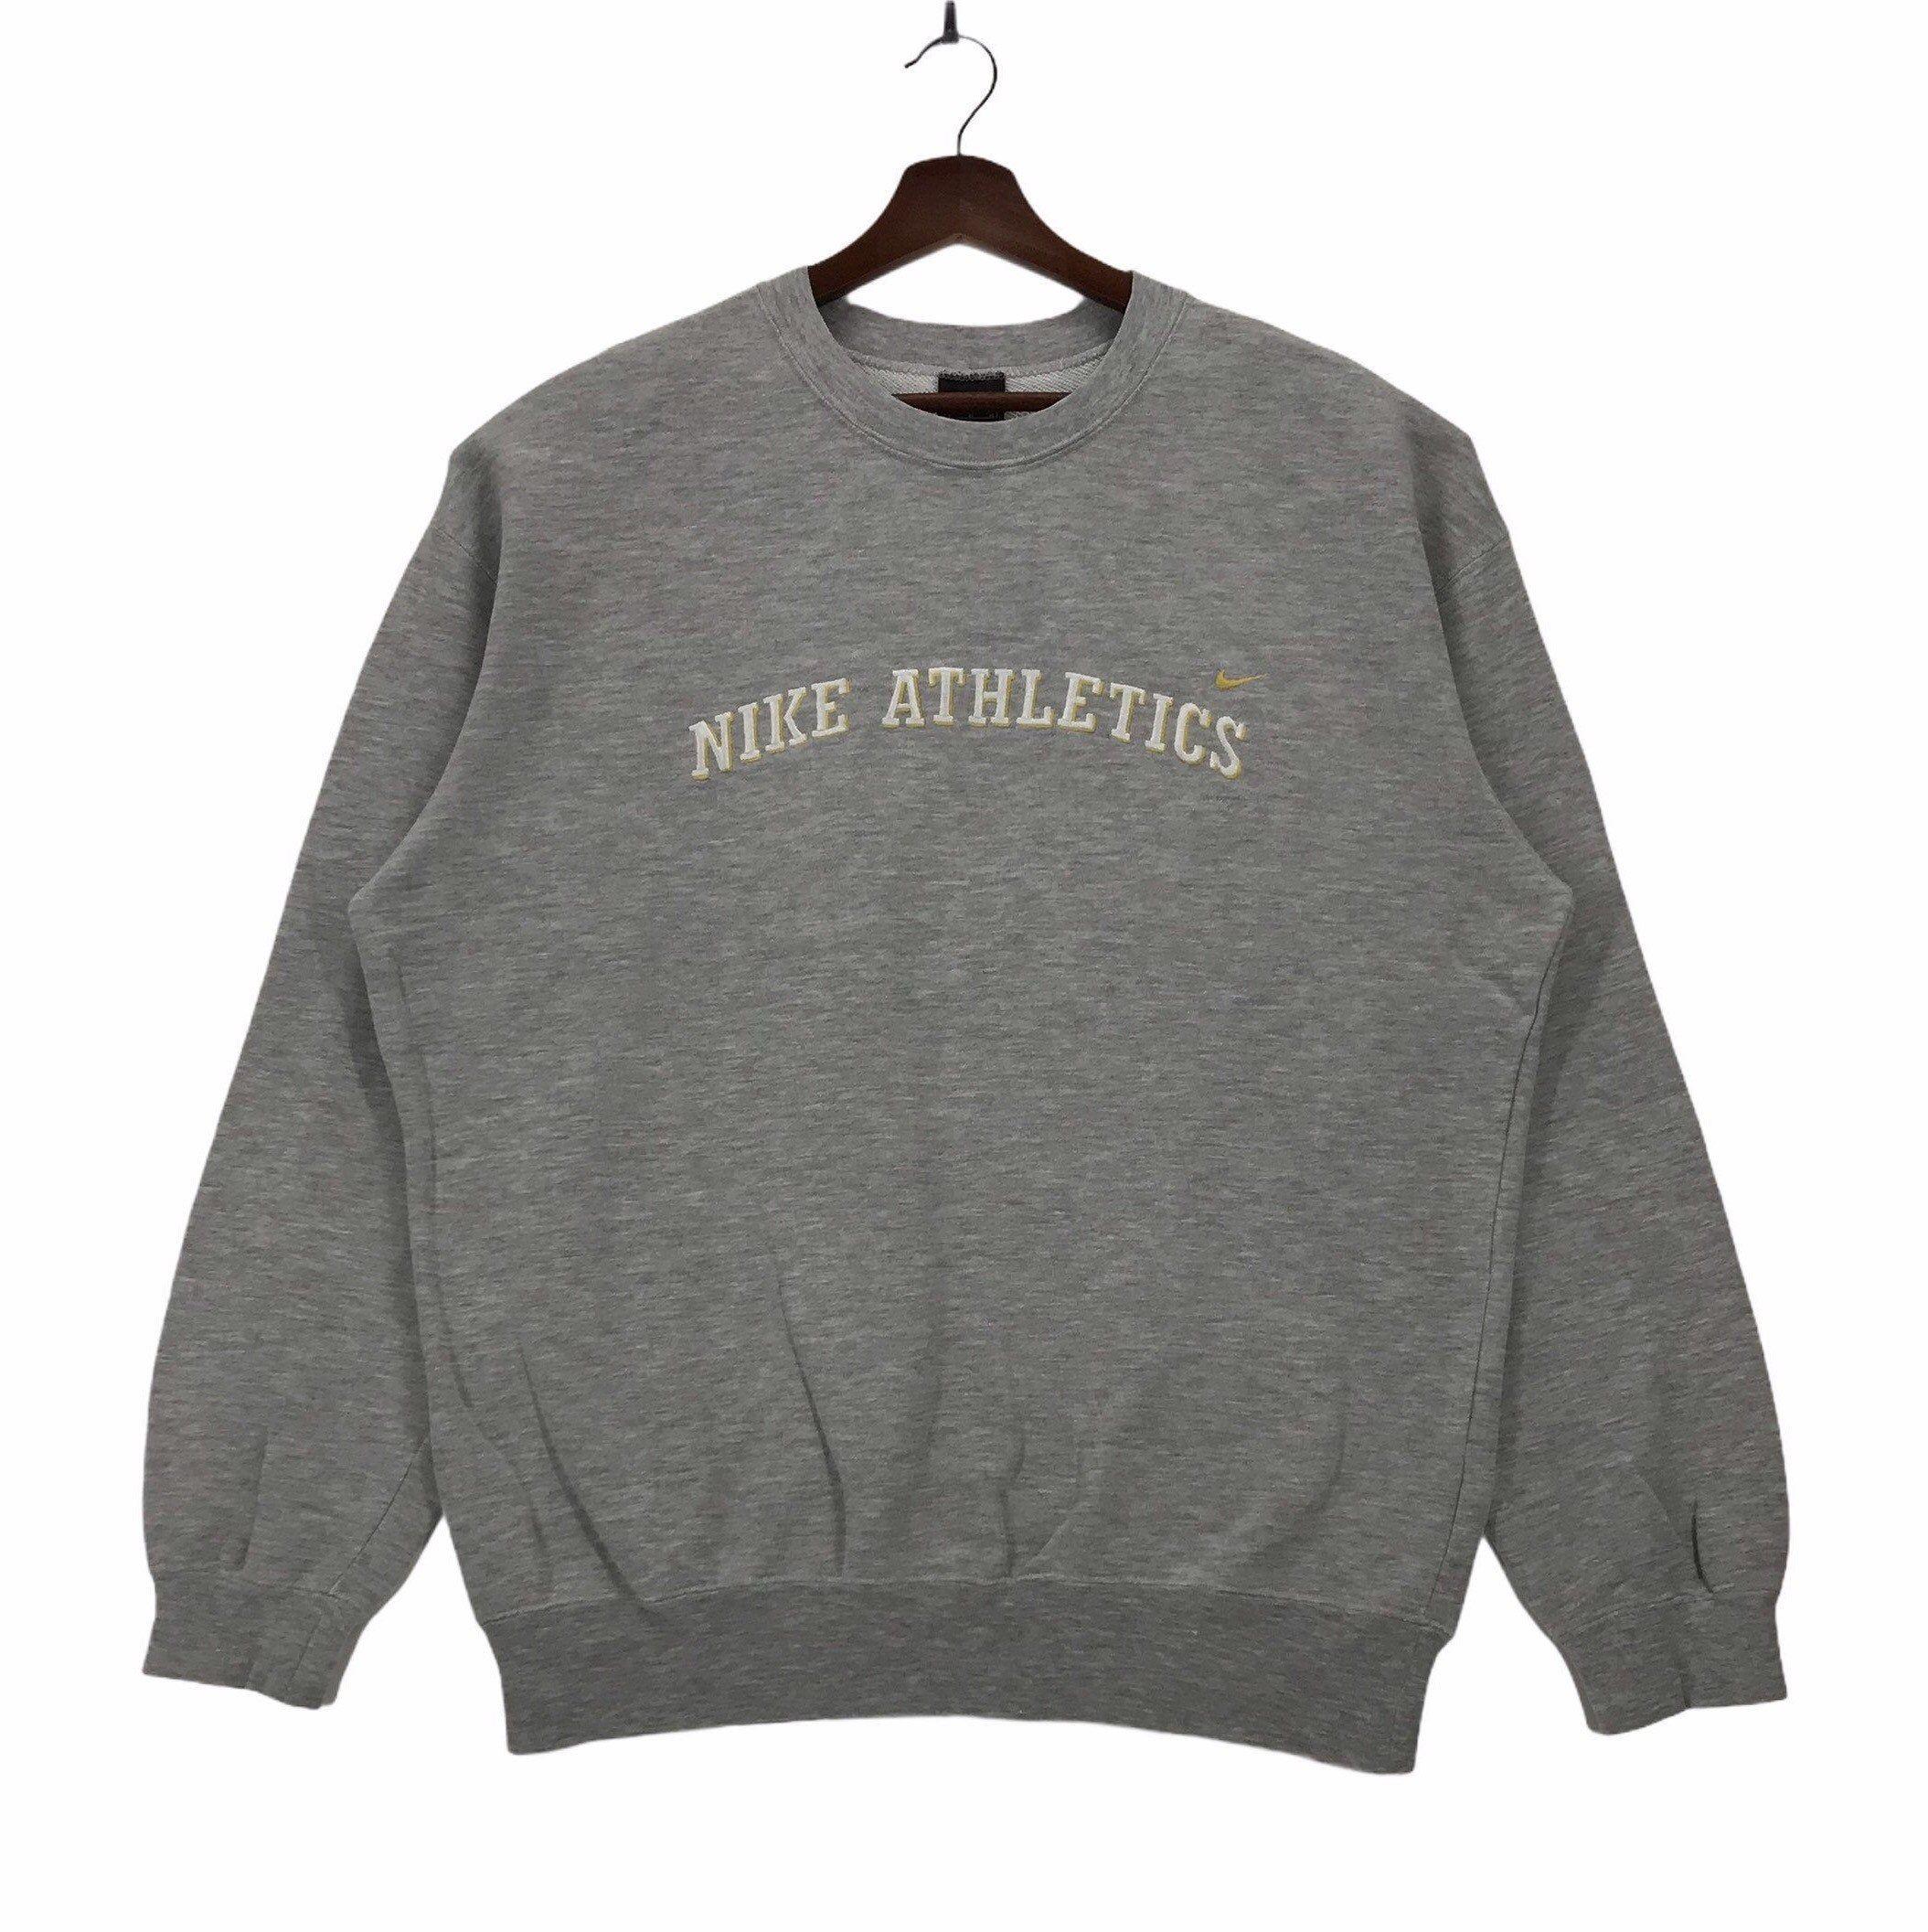 Vintage 90s Nike Sweatshirt Crewneck Spellout Nike Athletics Etsy Sweatshirts Vintage Sweatshirt Nike Sweatshirts [ 2113 x 2109 Pixel ]